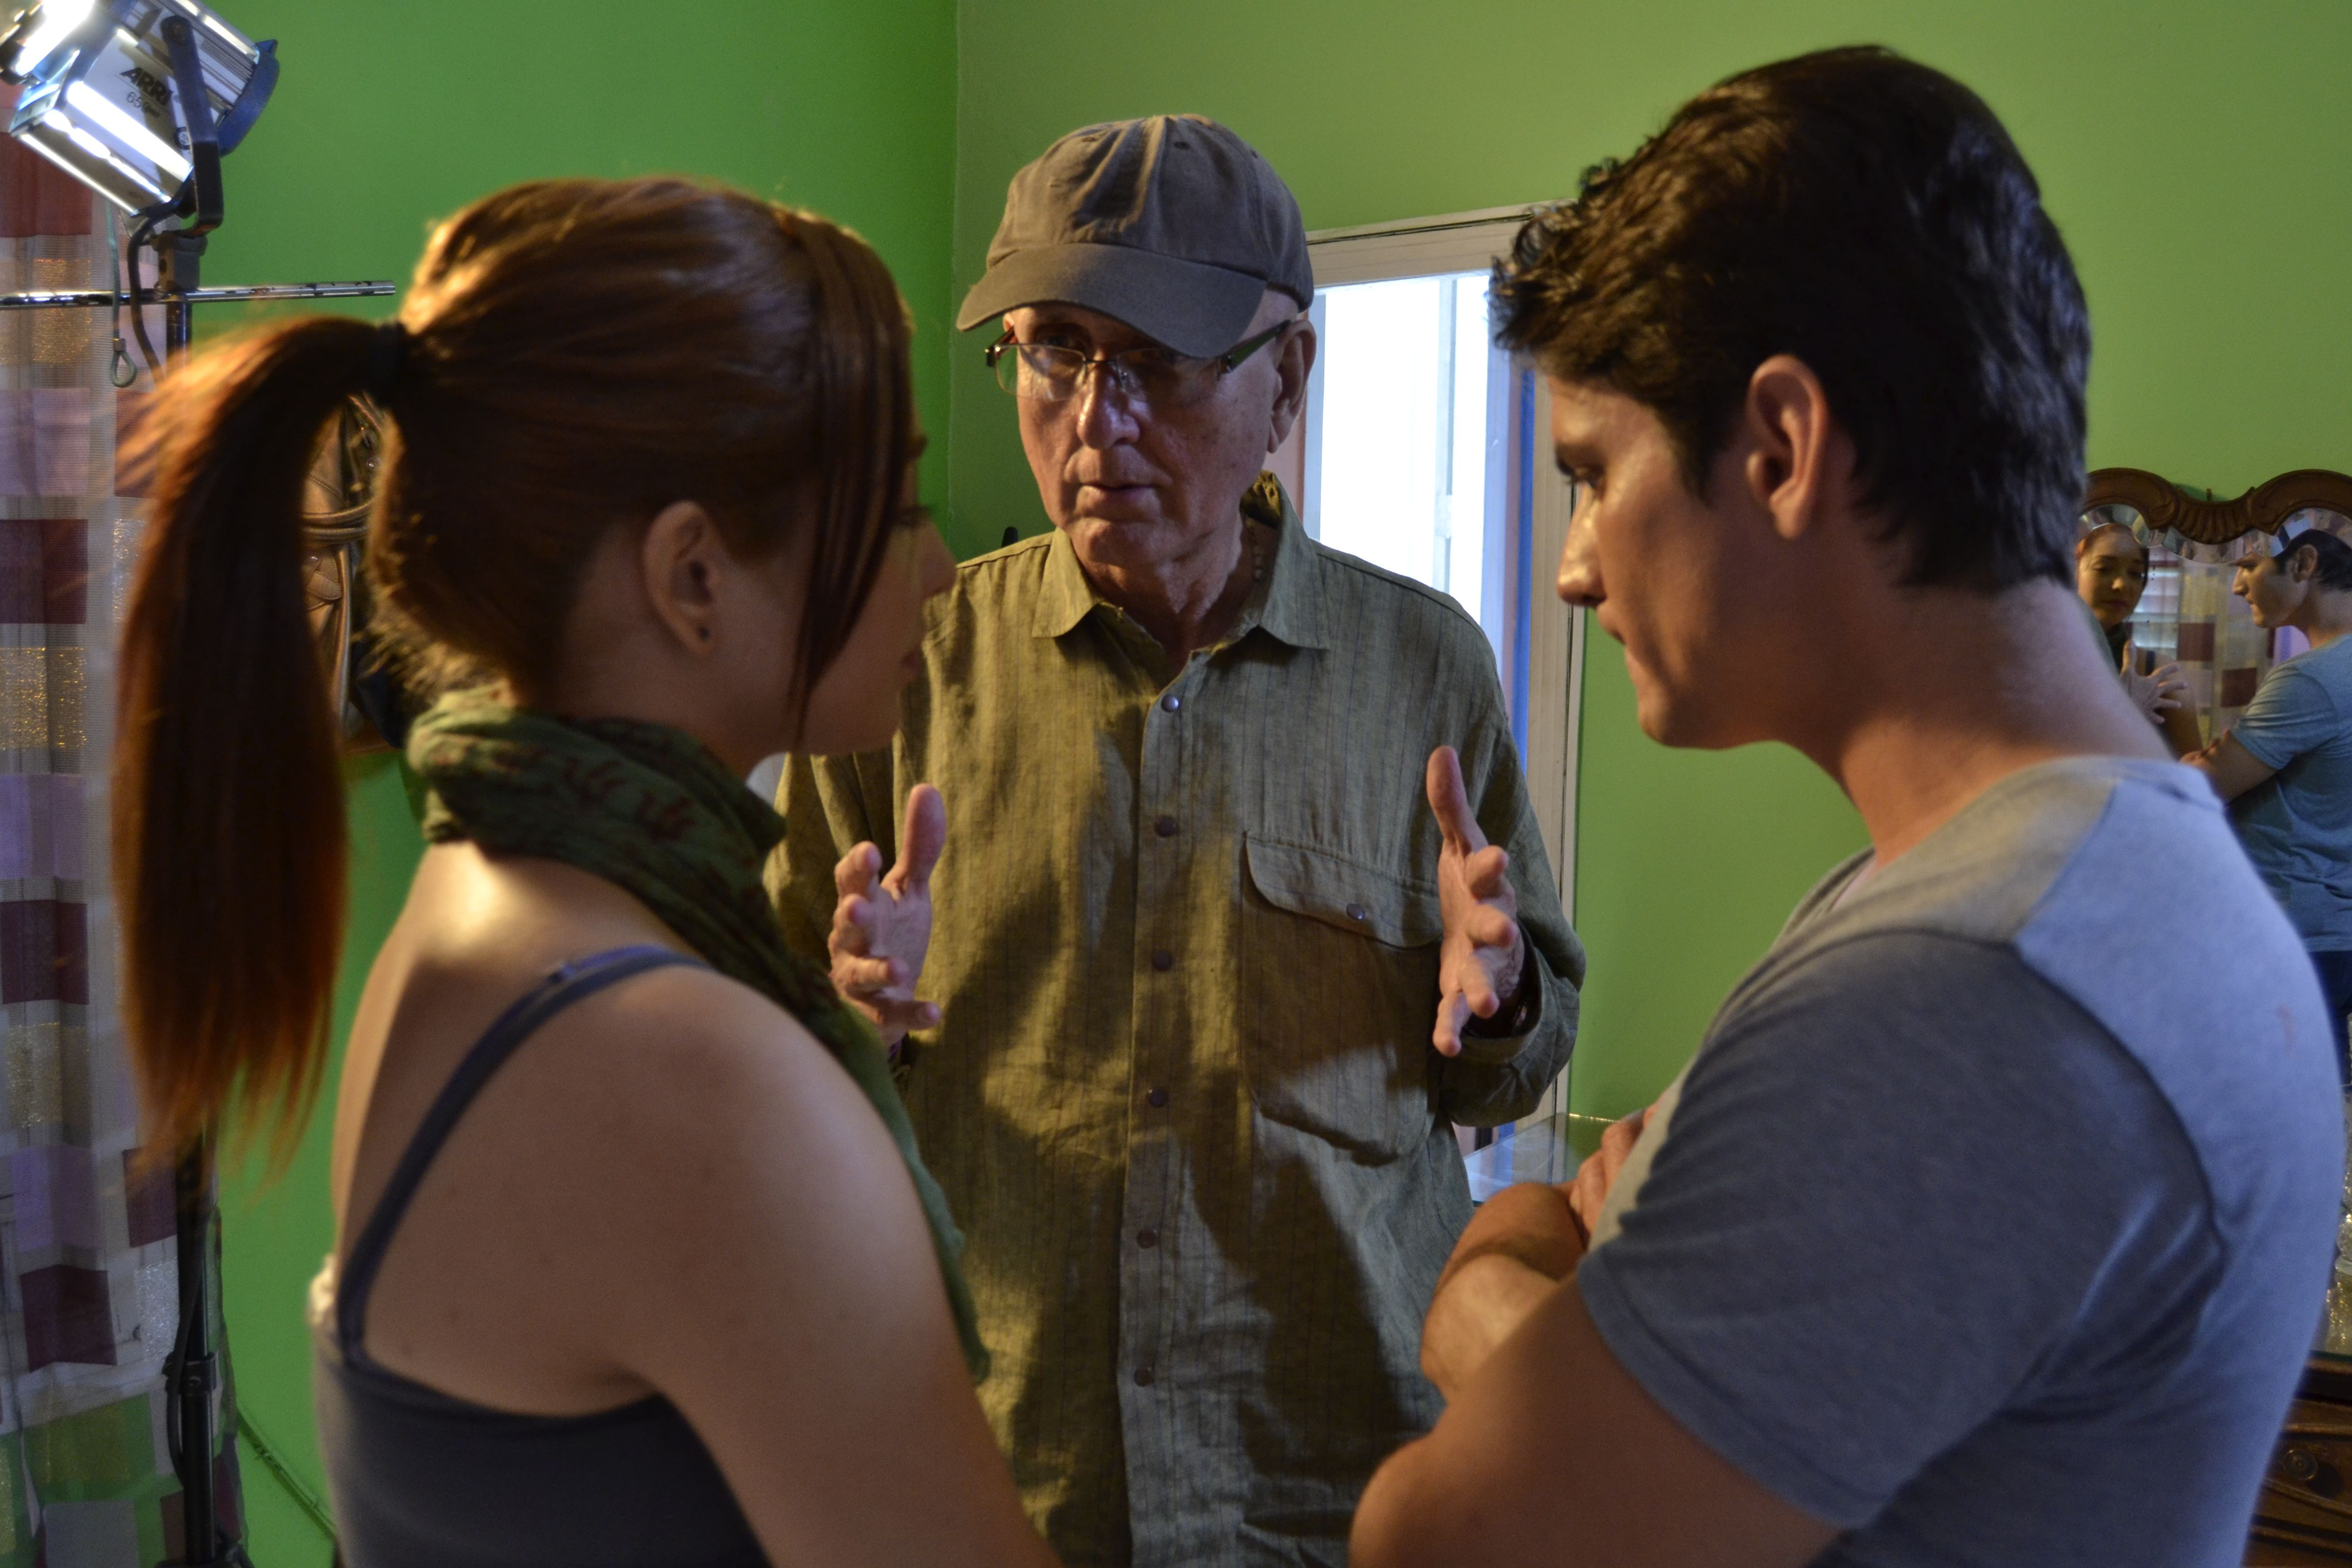 During the filming of La ciudad.